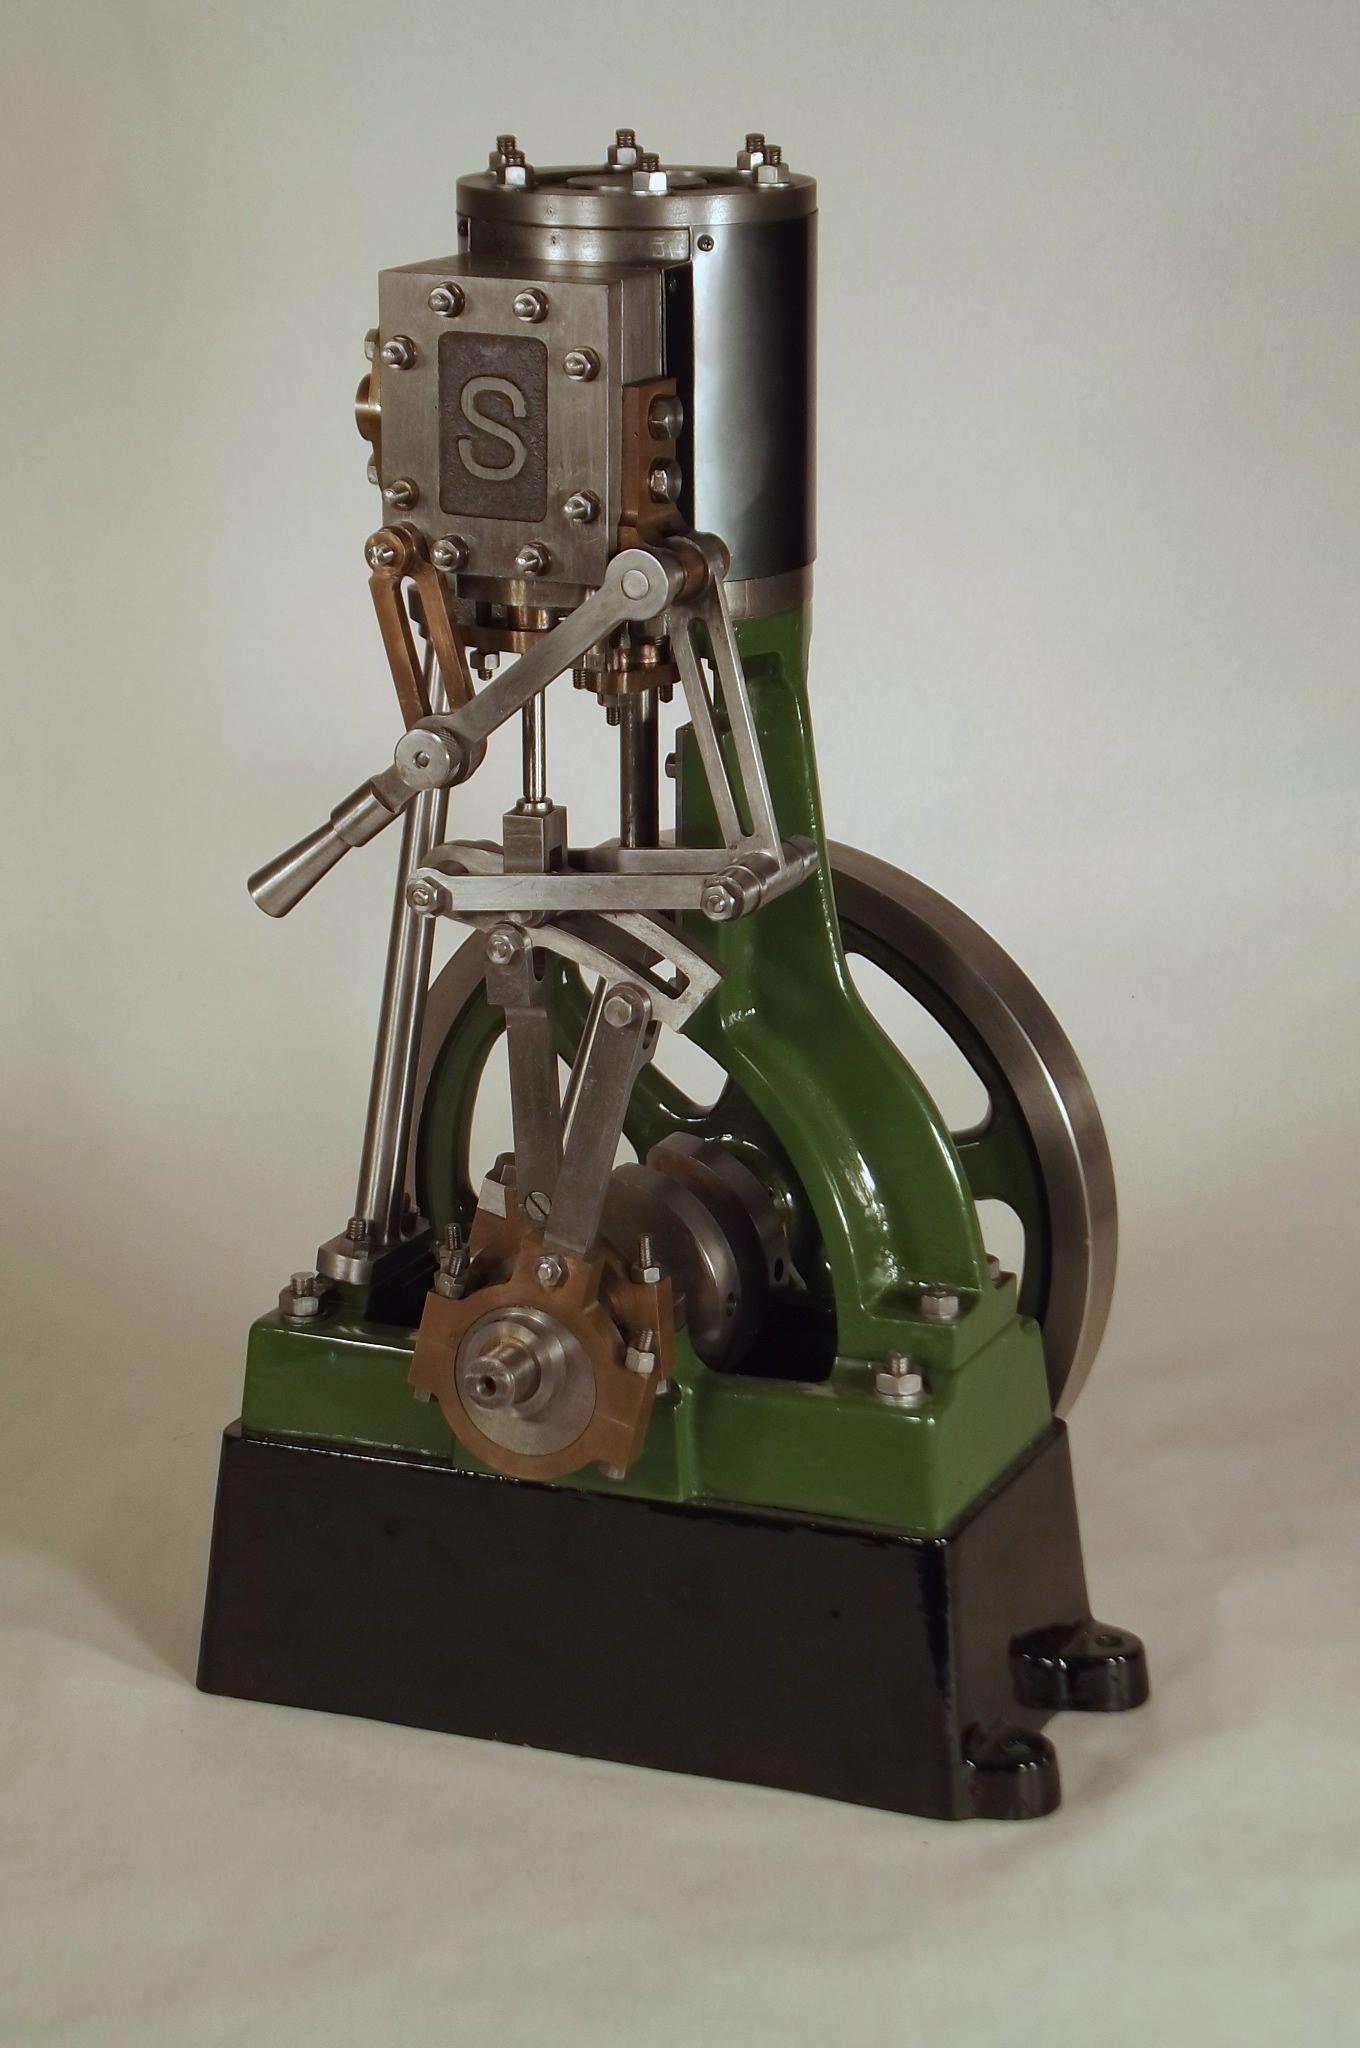 stuart turner steam model engine   engines   Pinterest   Engine ...